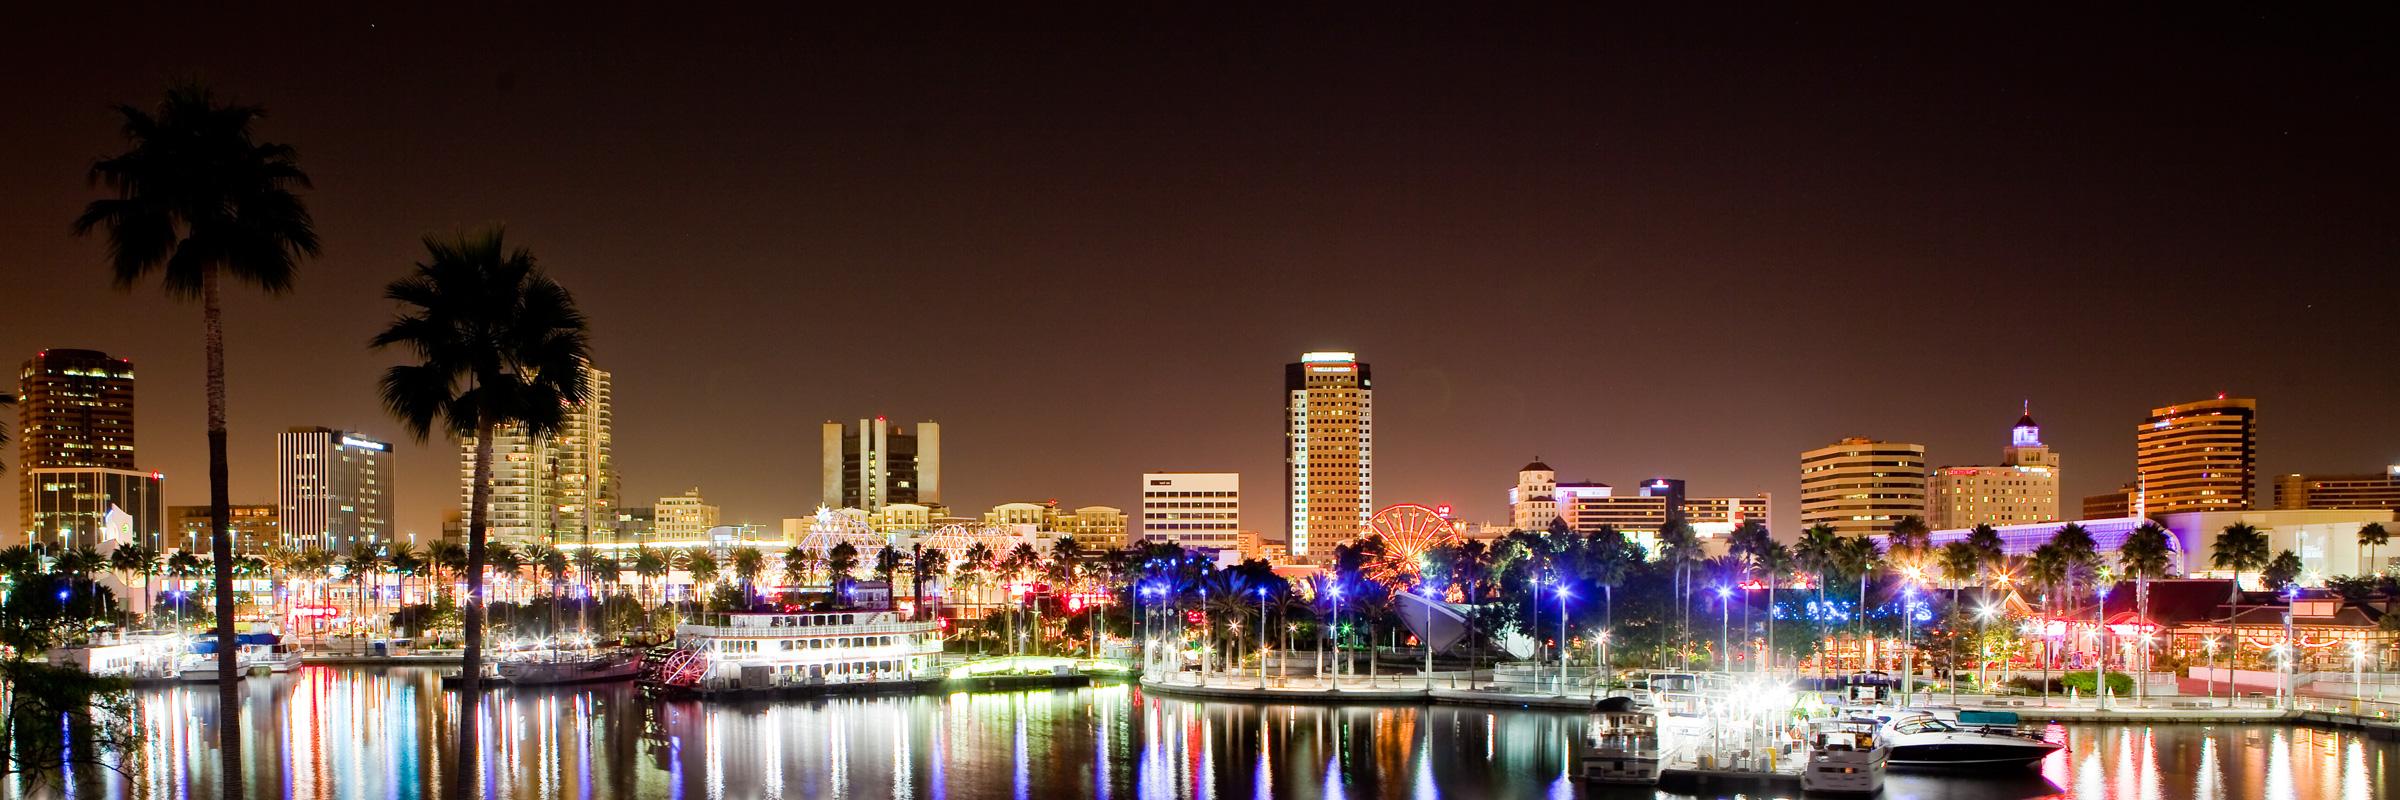 High Quality Long Beach California Wallpaper Full HD Pictures 2400x800